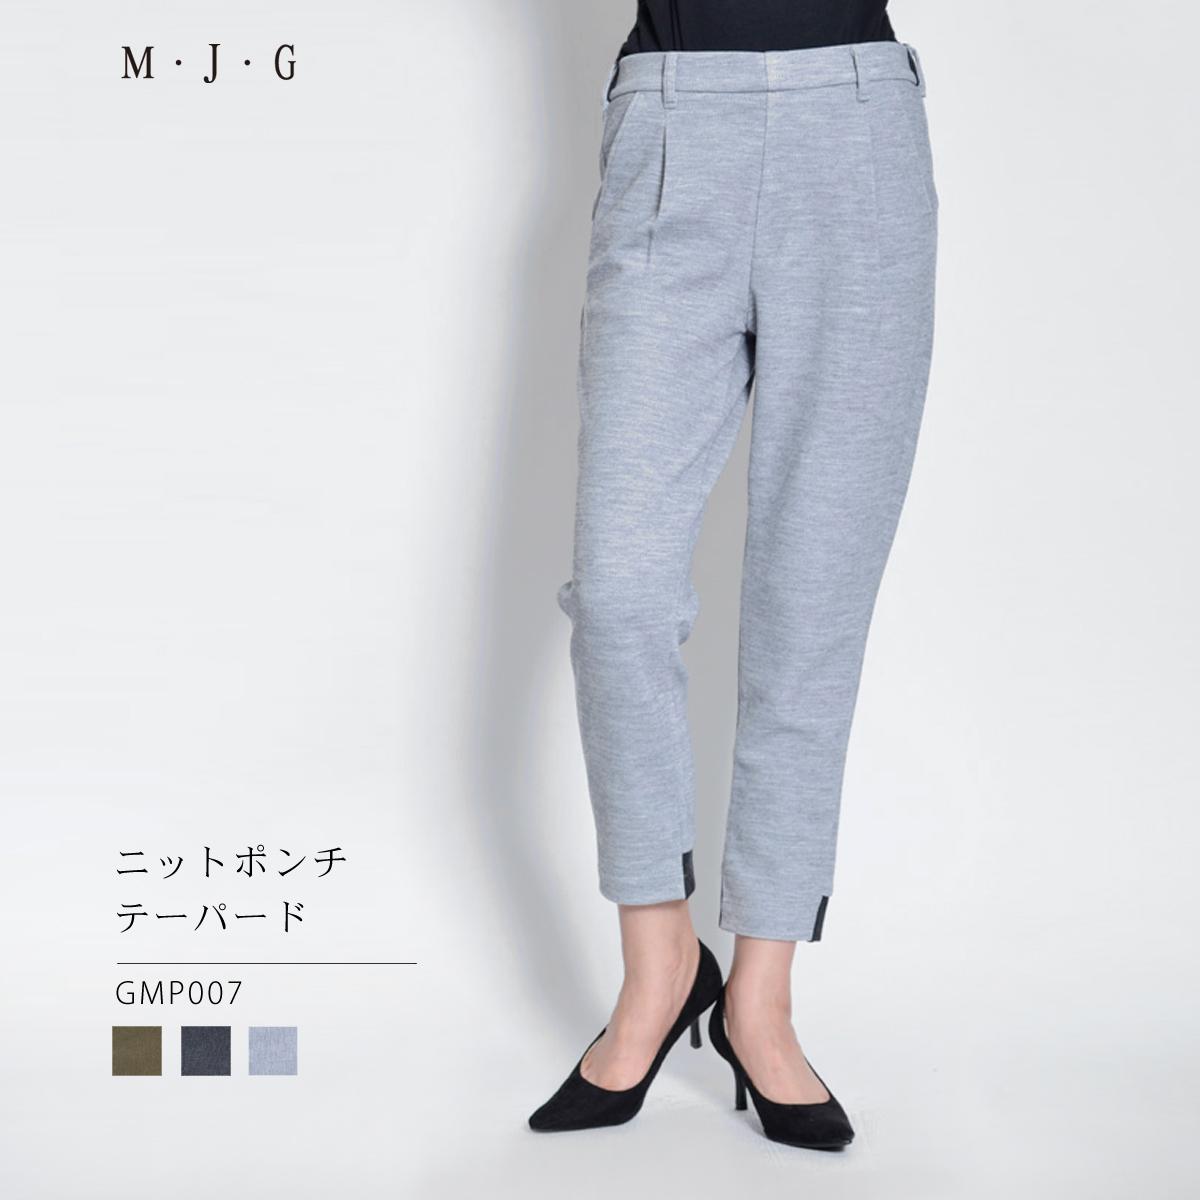 【TIME SALE】テーパード GMP007